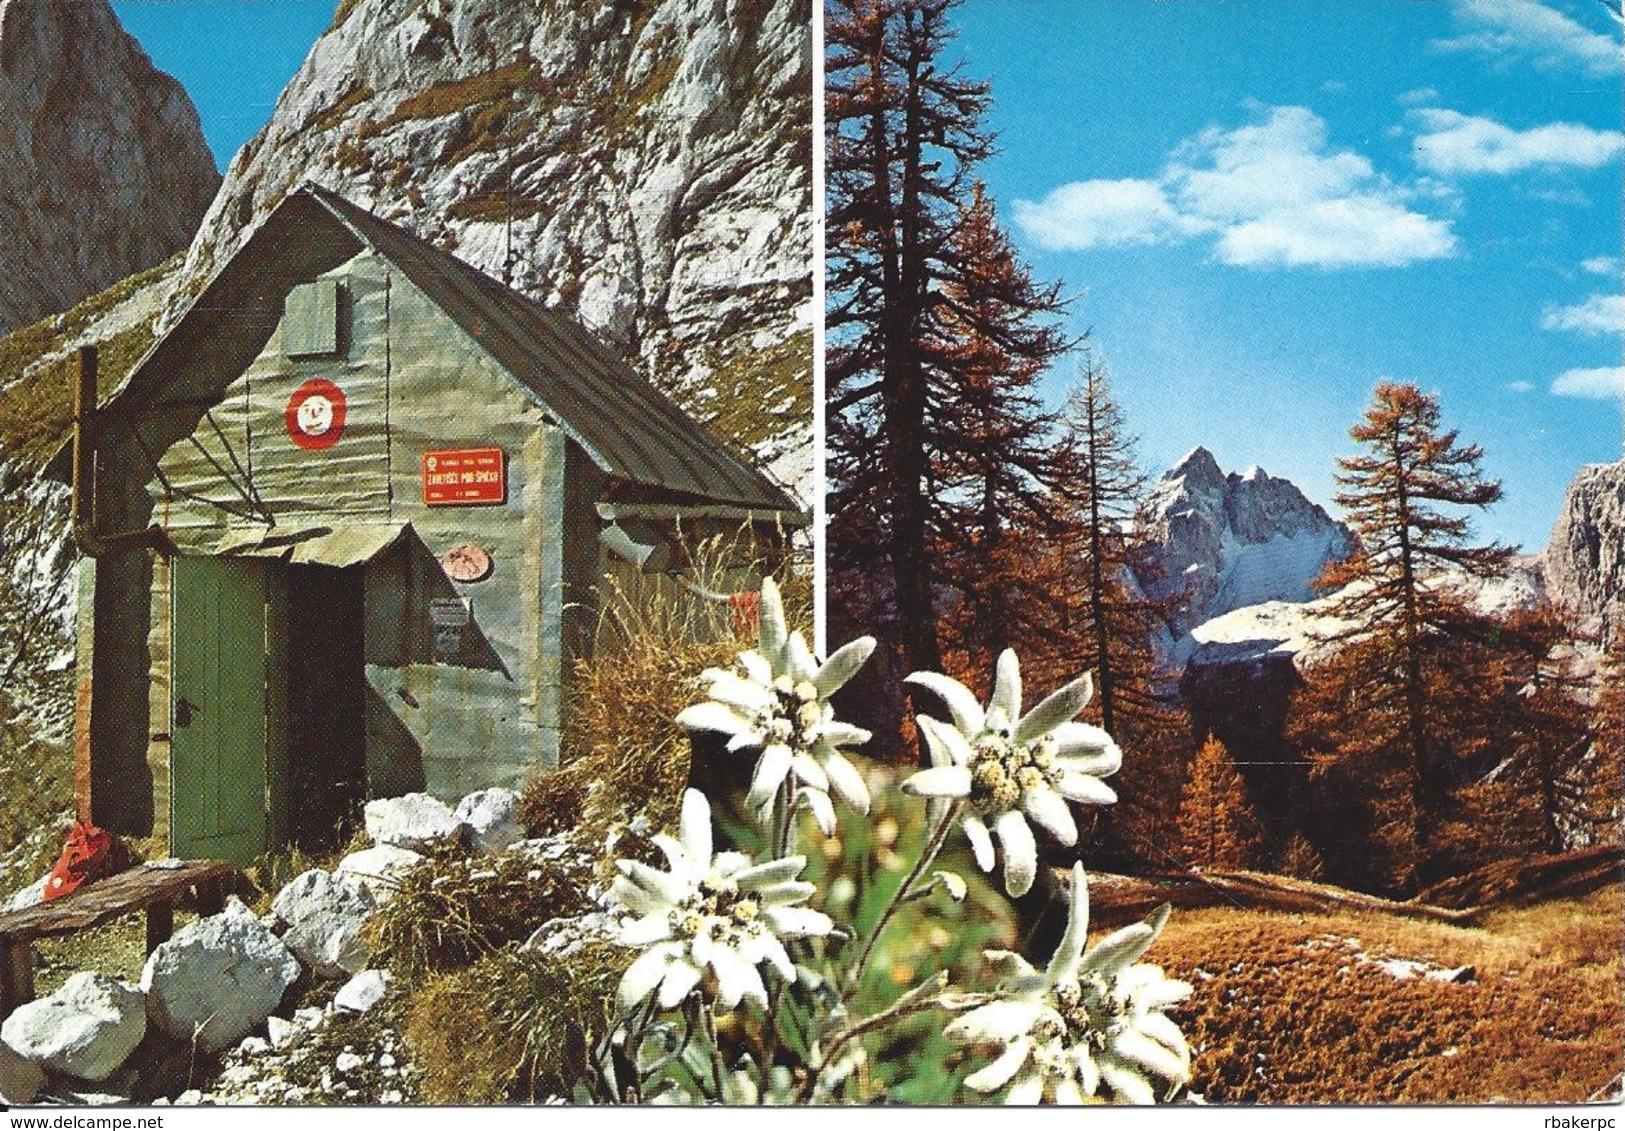 Stamped/Used Postcard - Mountain Scene - Yugoslavia